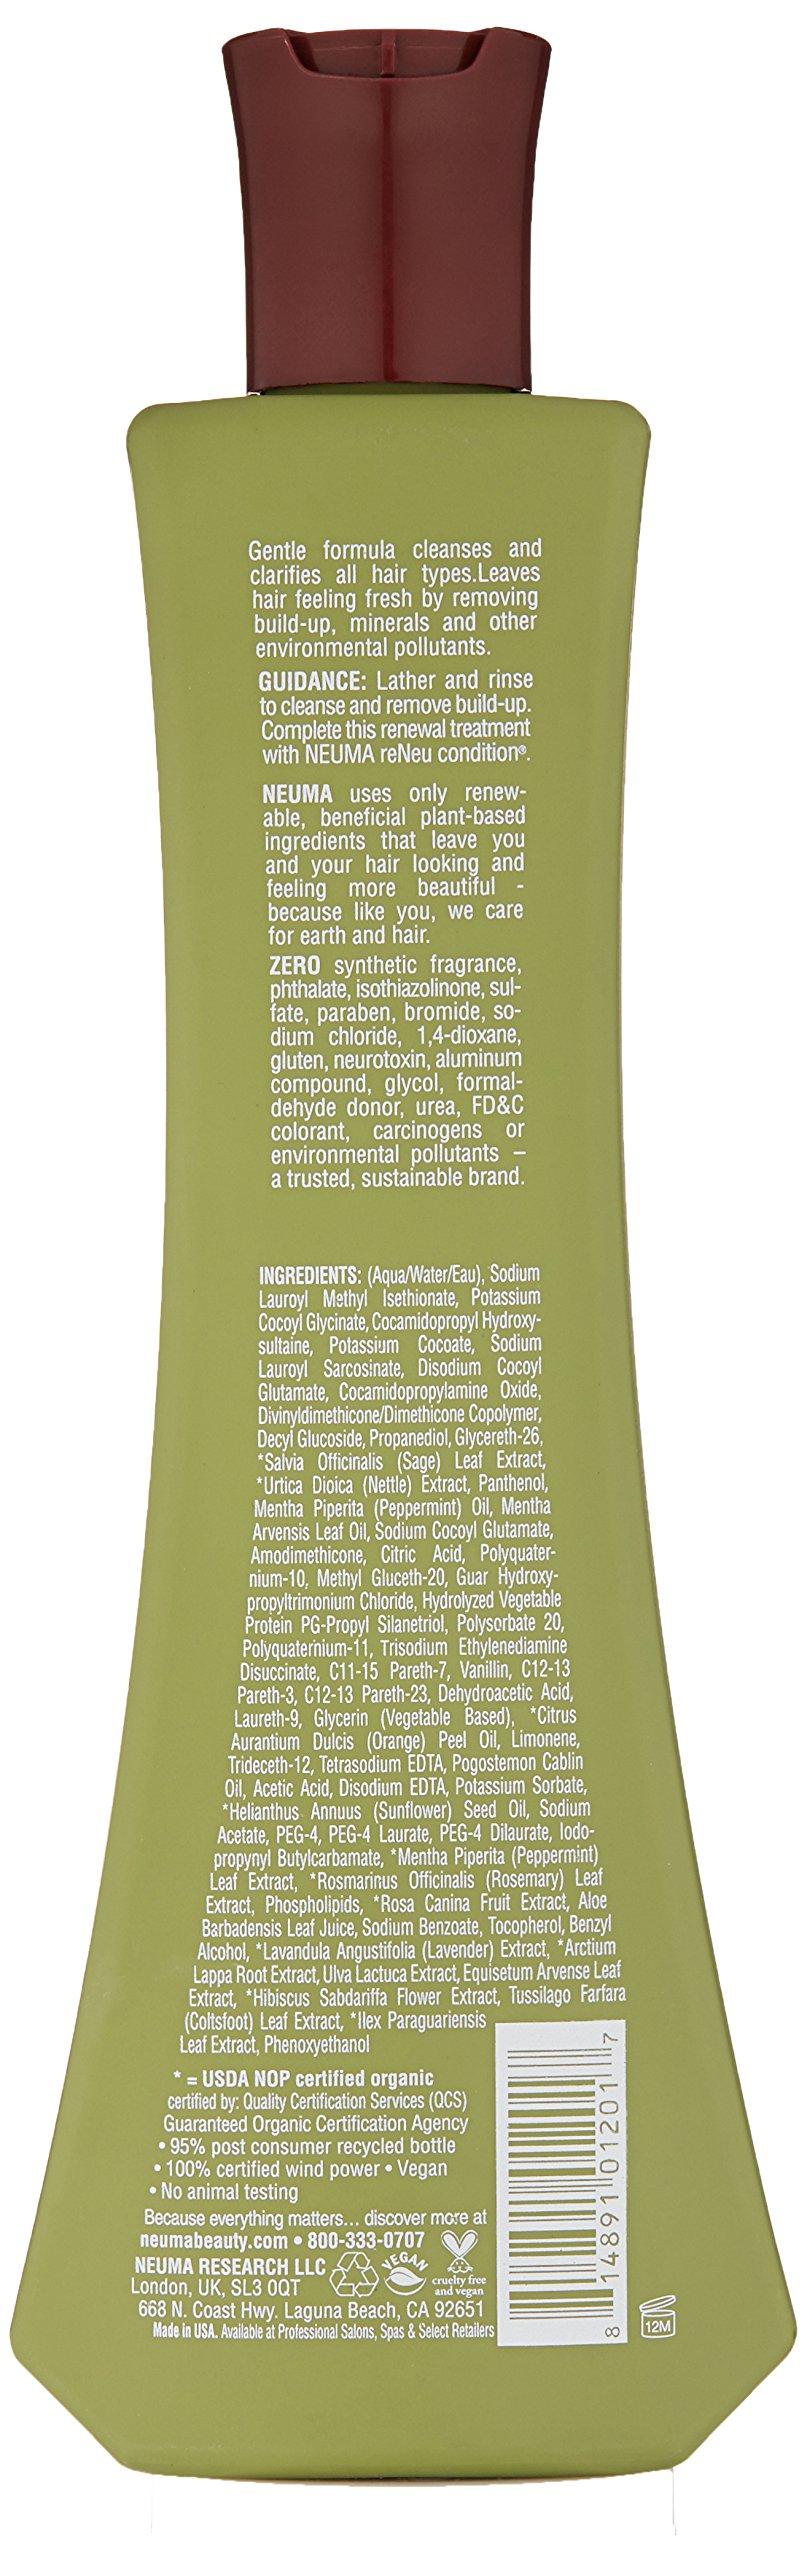 Neuma ReNeu Cleanse Shampoo, 10.1 Fluid Ounce by Neuma (Image #2)